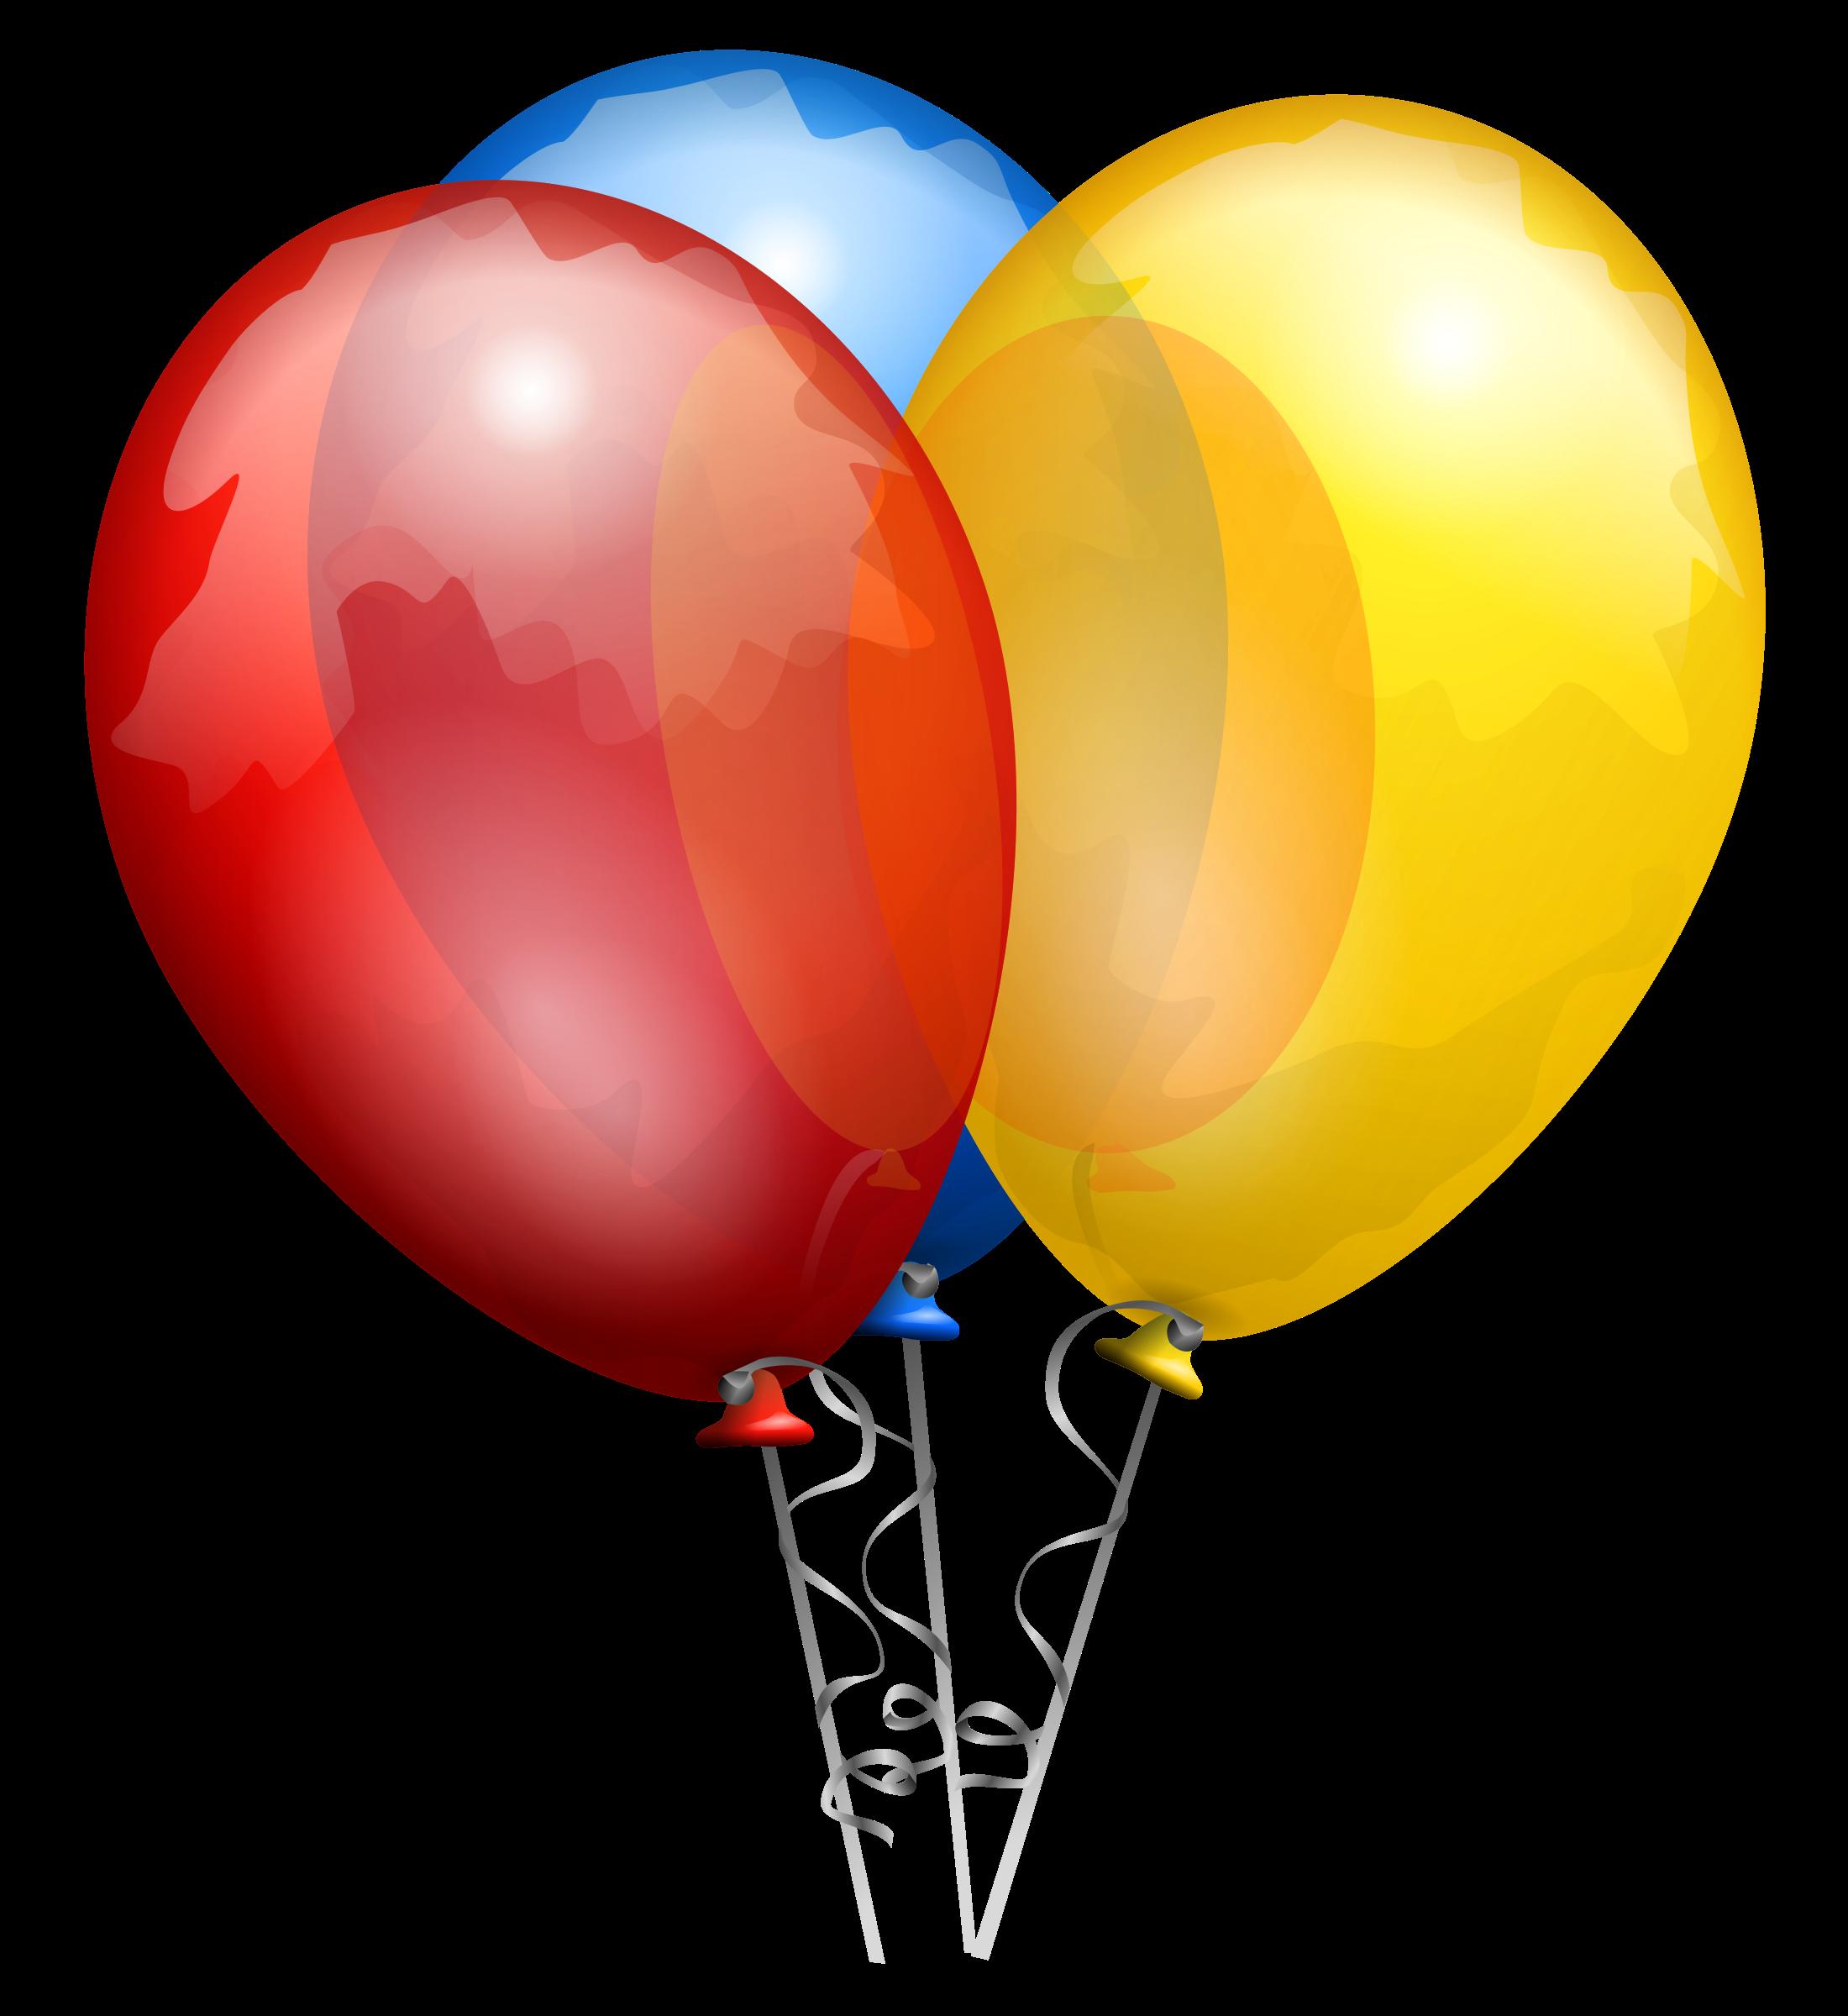 Party balloons big image. Celebration clipart balloon